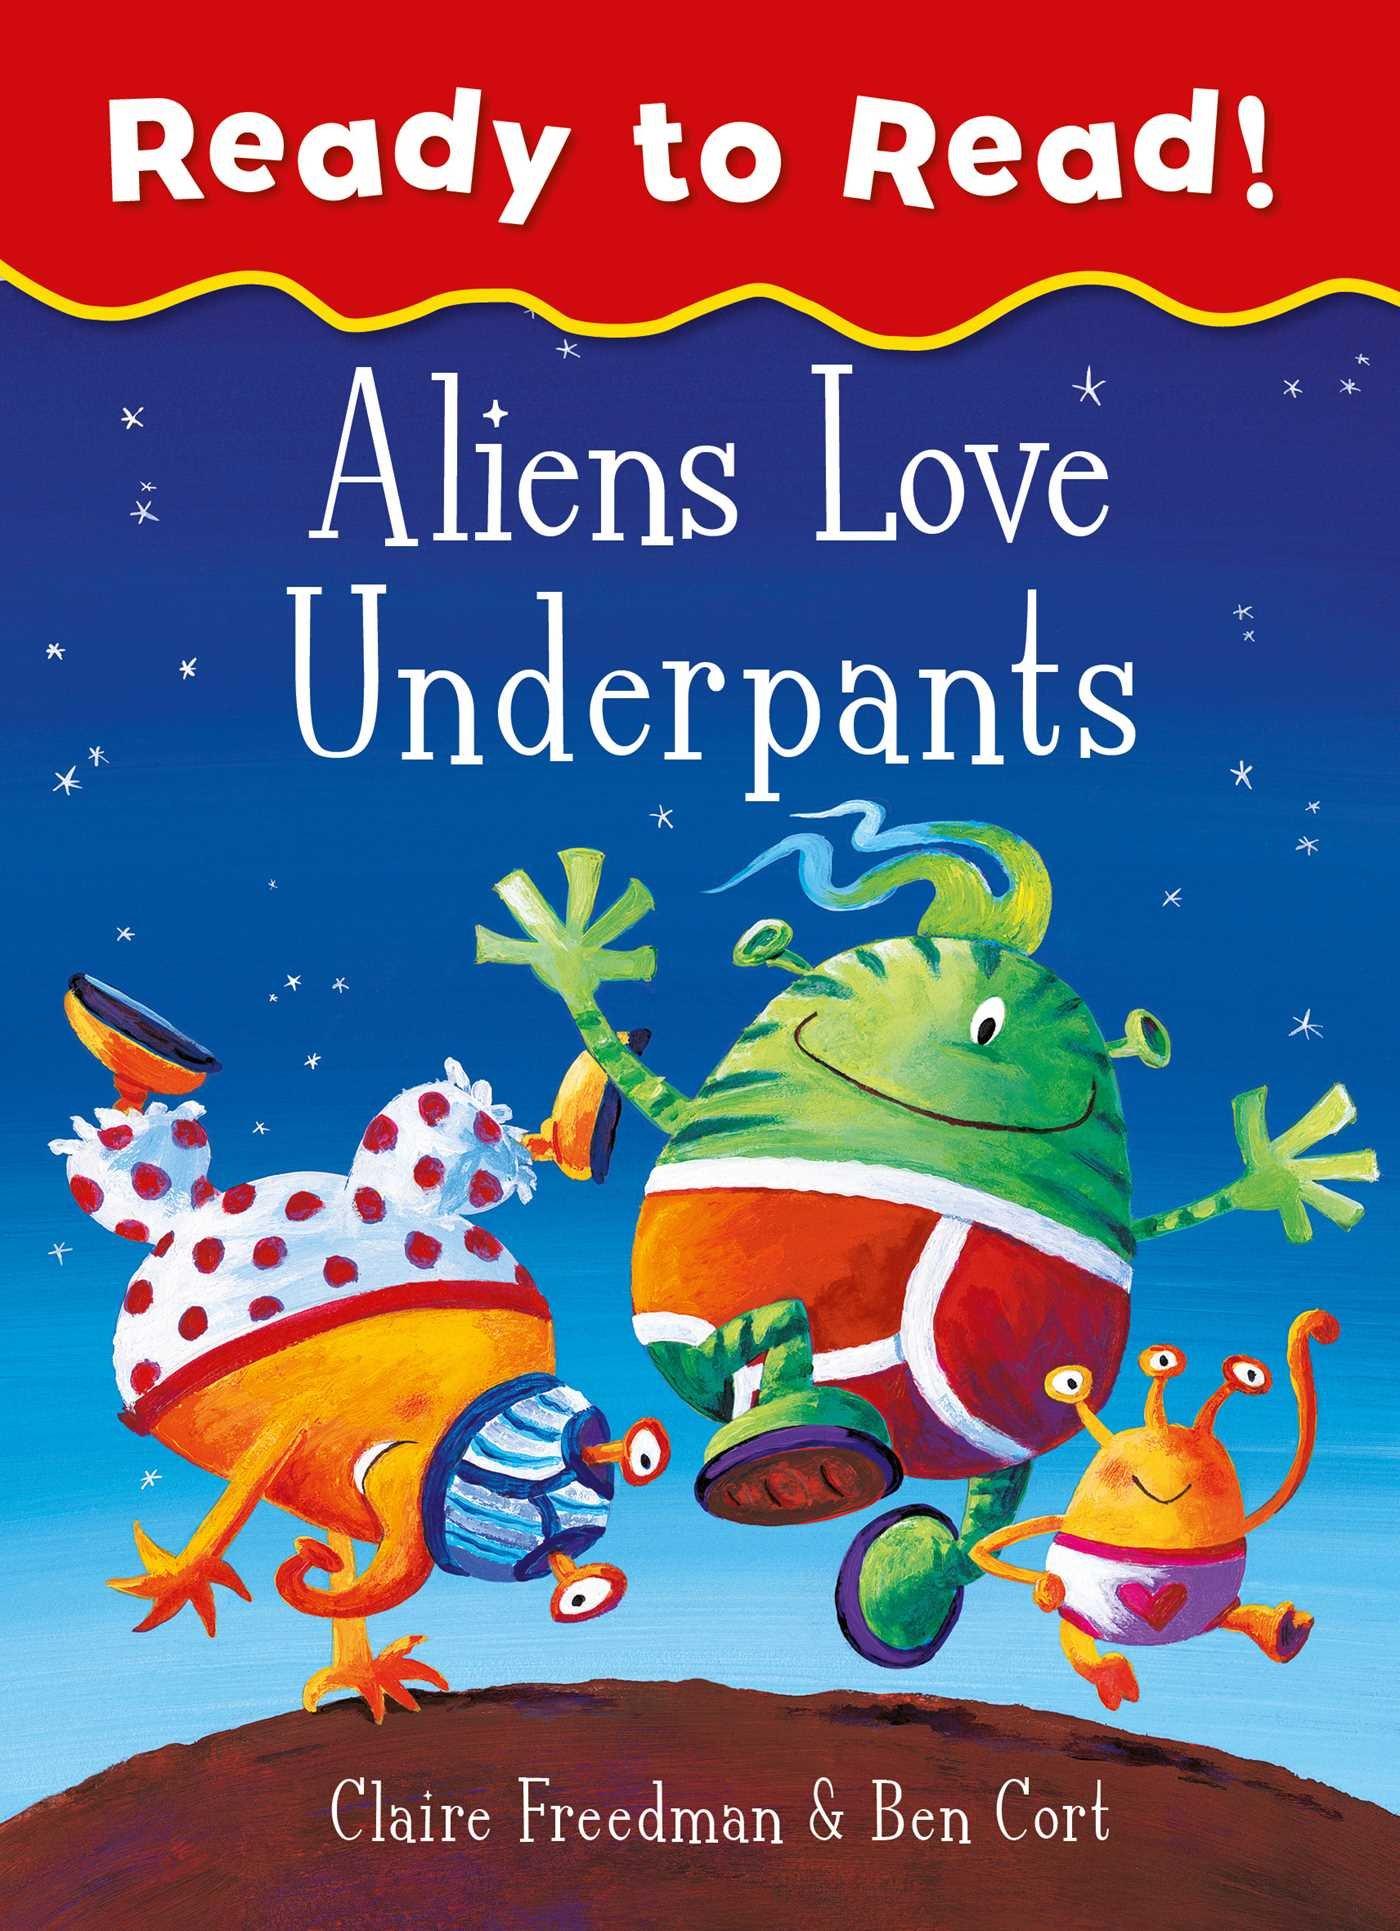 Aliens Love Underpants Ready to Read: Amazon.co.uk: Freedman, Claire, Cort, Ben: 9781471163333: Books